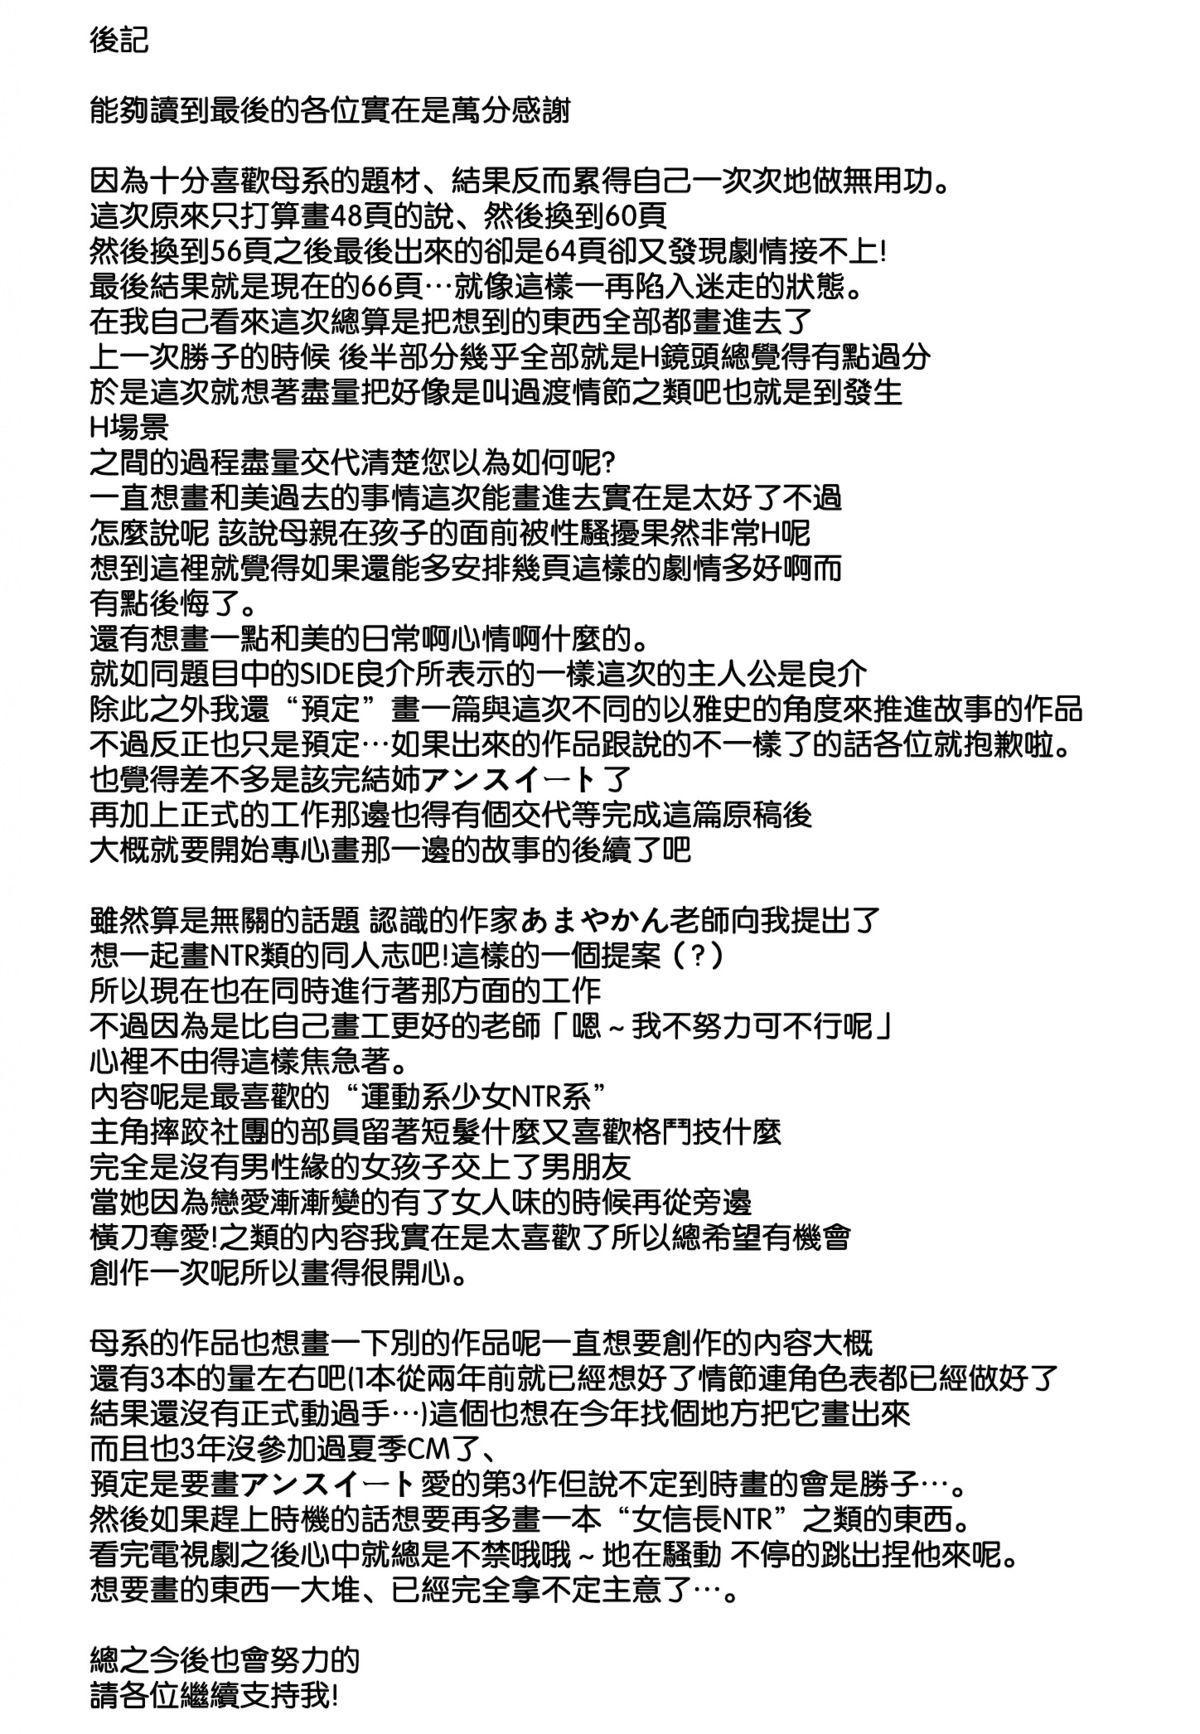 UnSweet Haha Wakui Kazumi Plus SIDE Hitori Musuko Ryousuke   Unsweet Mom Aimi Wakui - SIDE her only son Yoshisuke 66